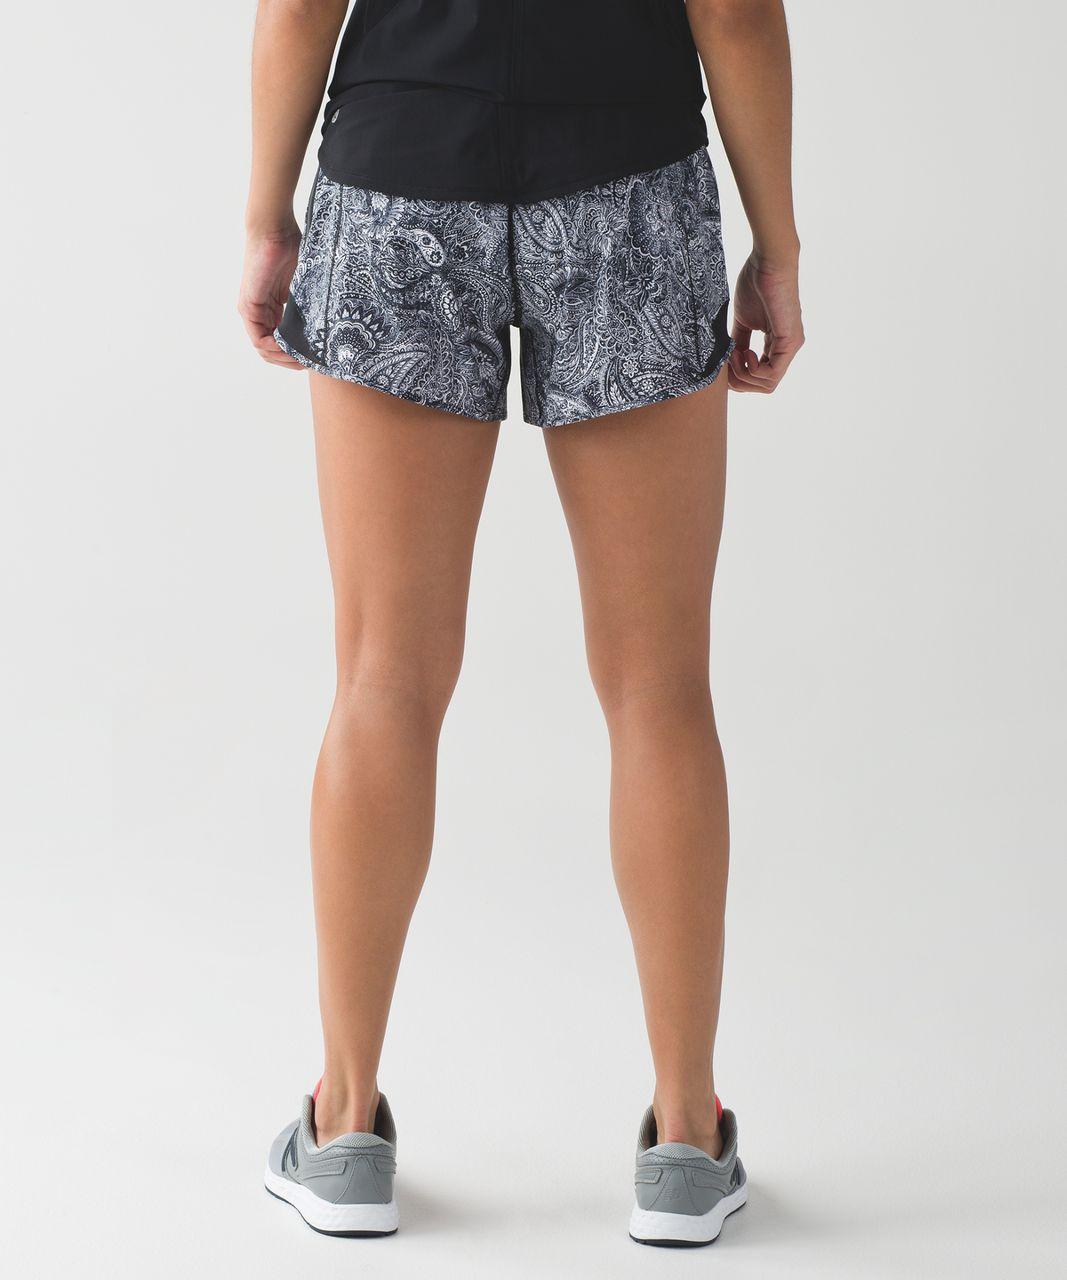 Lululemon Hotty Hot Short (Long) - Mini Antique Paisley White Black / Black